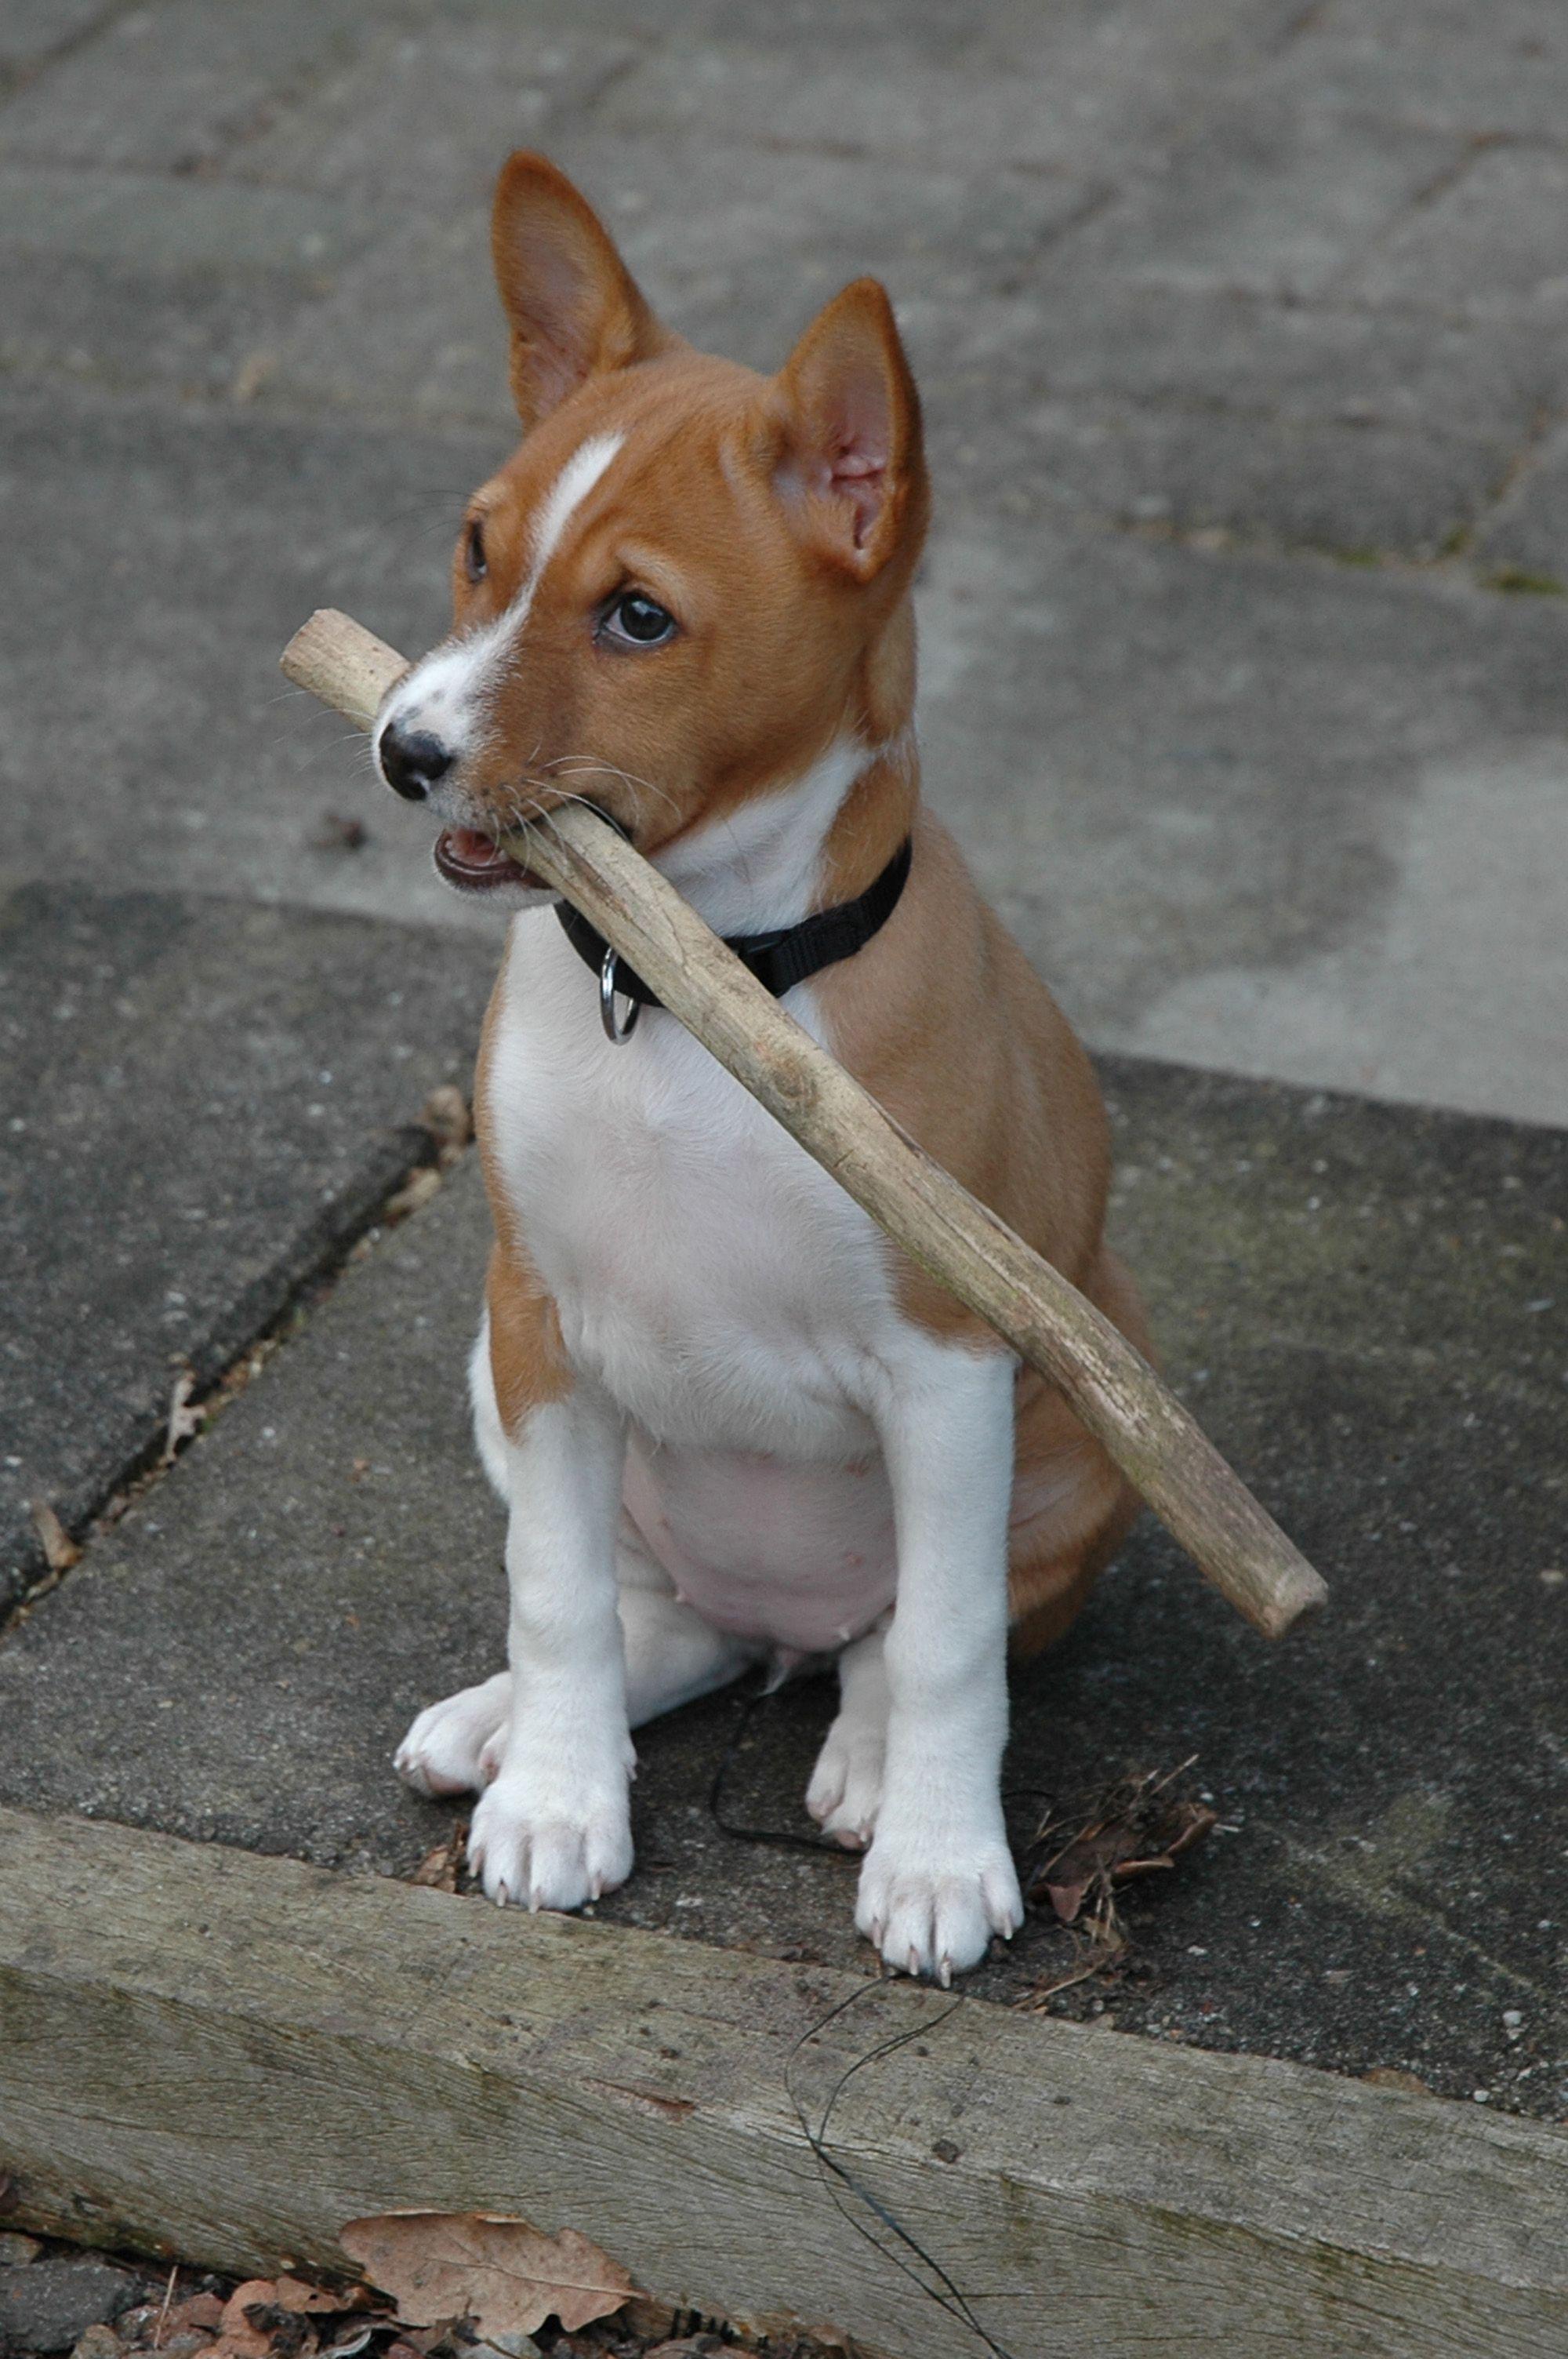 Kira 9 Weken Oud Basenji Puppy Basenji Dogs Dogs